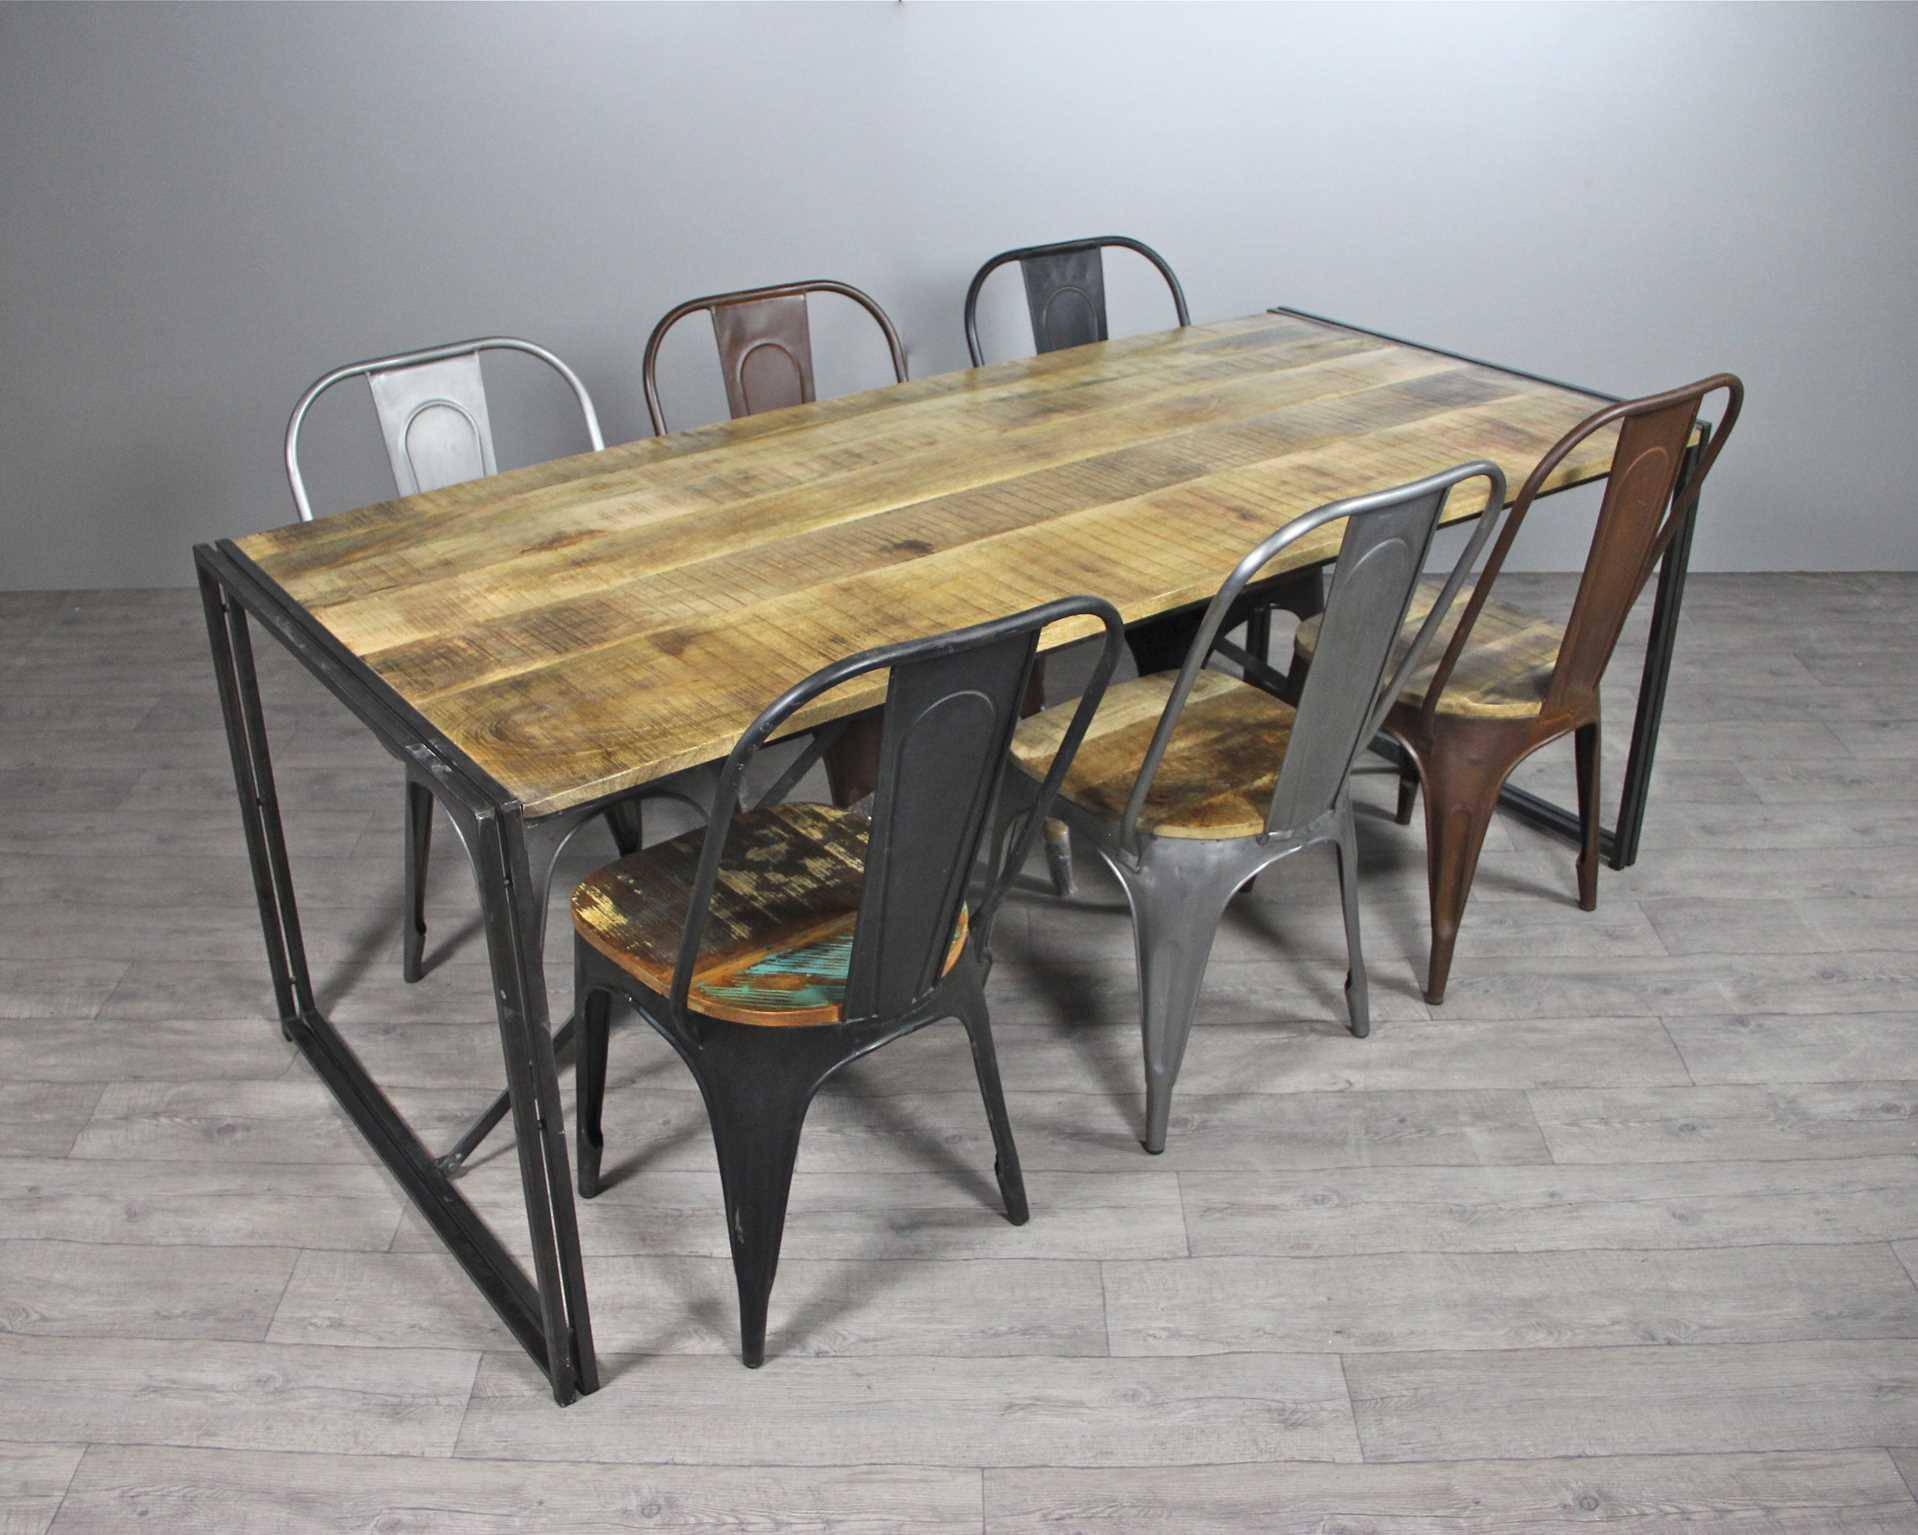 tables chaises meubles industriel 40 tables chaises. Black Bedroom Furniture Sets. Home Design Ideas